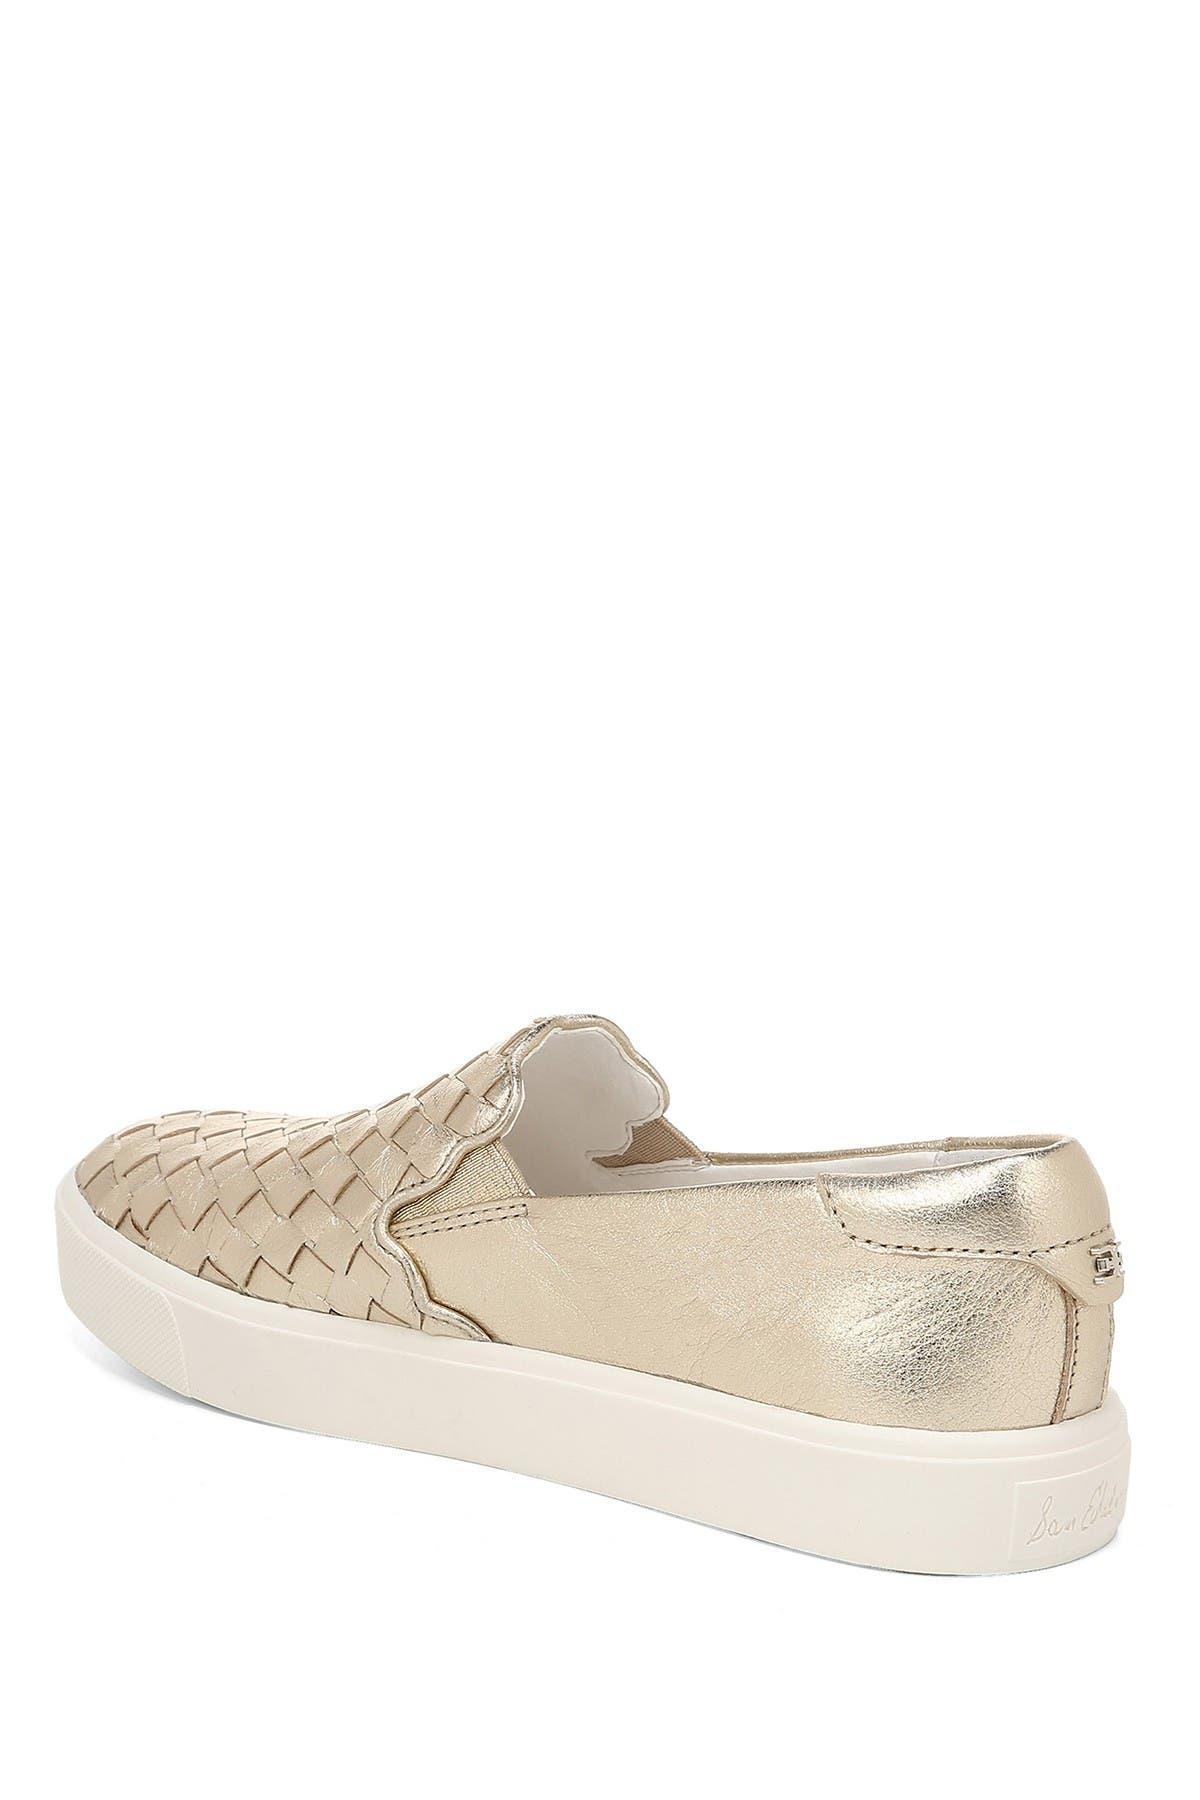 Sam Edelman | Eda Slip-On Sneaker